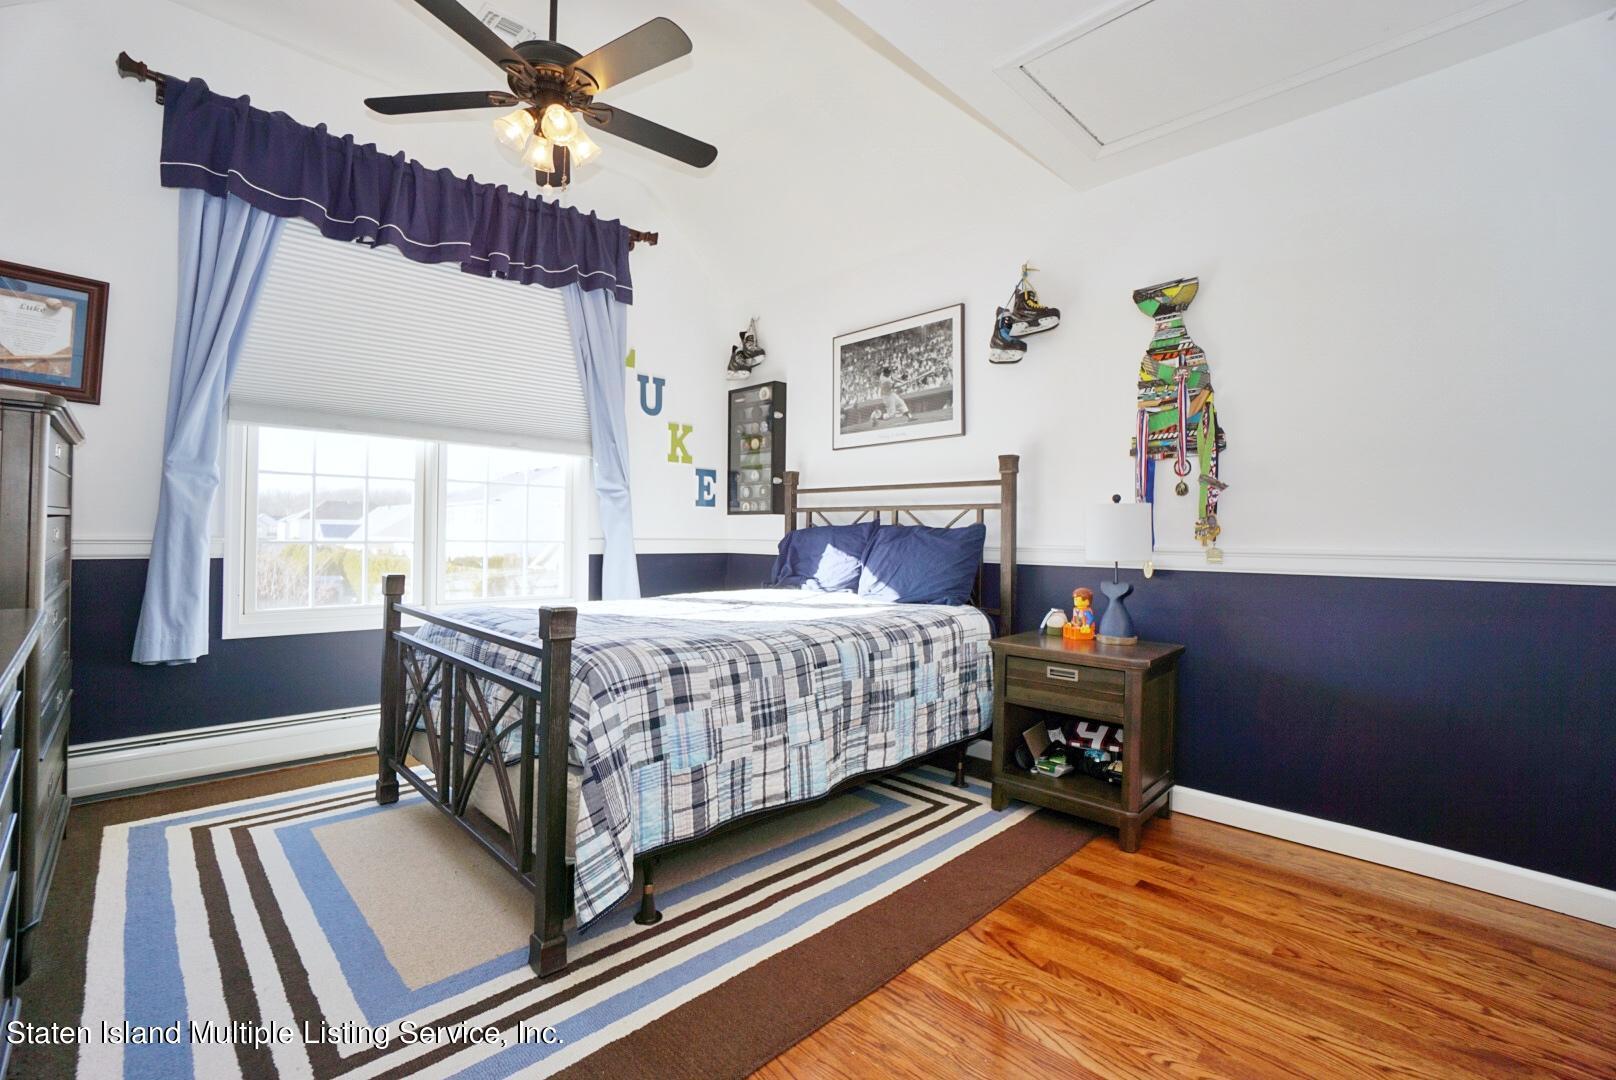 Single Family - Detached 31 Belwood Loop  Staten Island, NY 10307, MLS-1143133-38